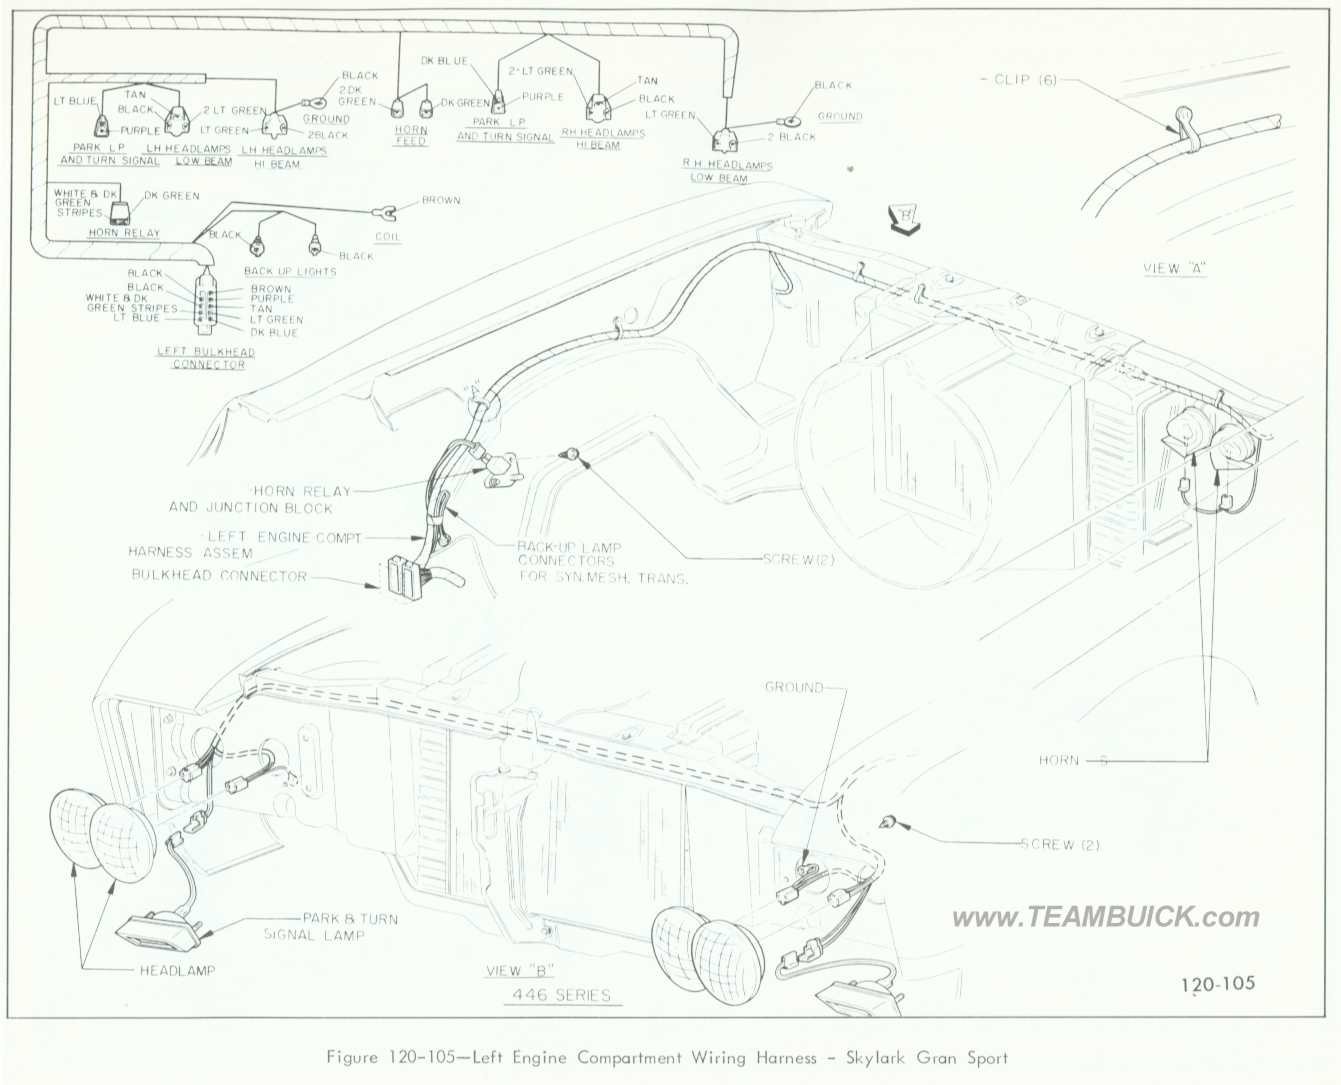 hight resolution of 1966 buick skylark gran sport left engine compartment wiring harness